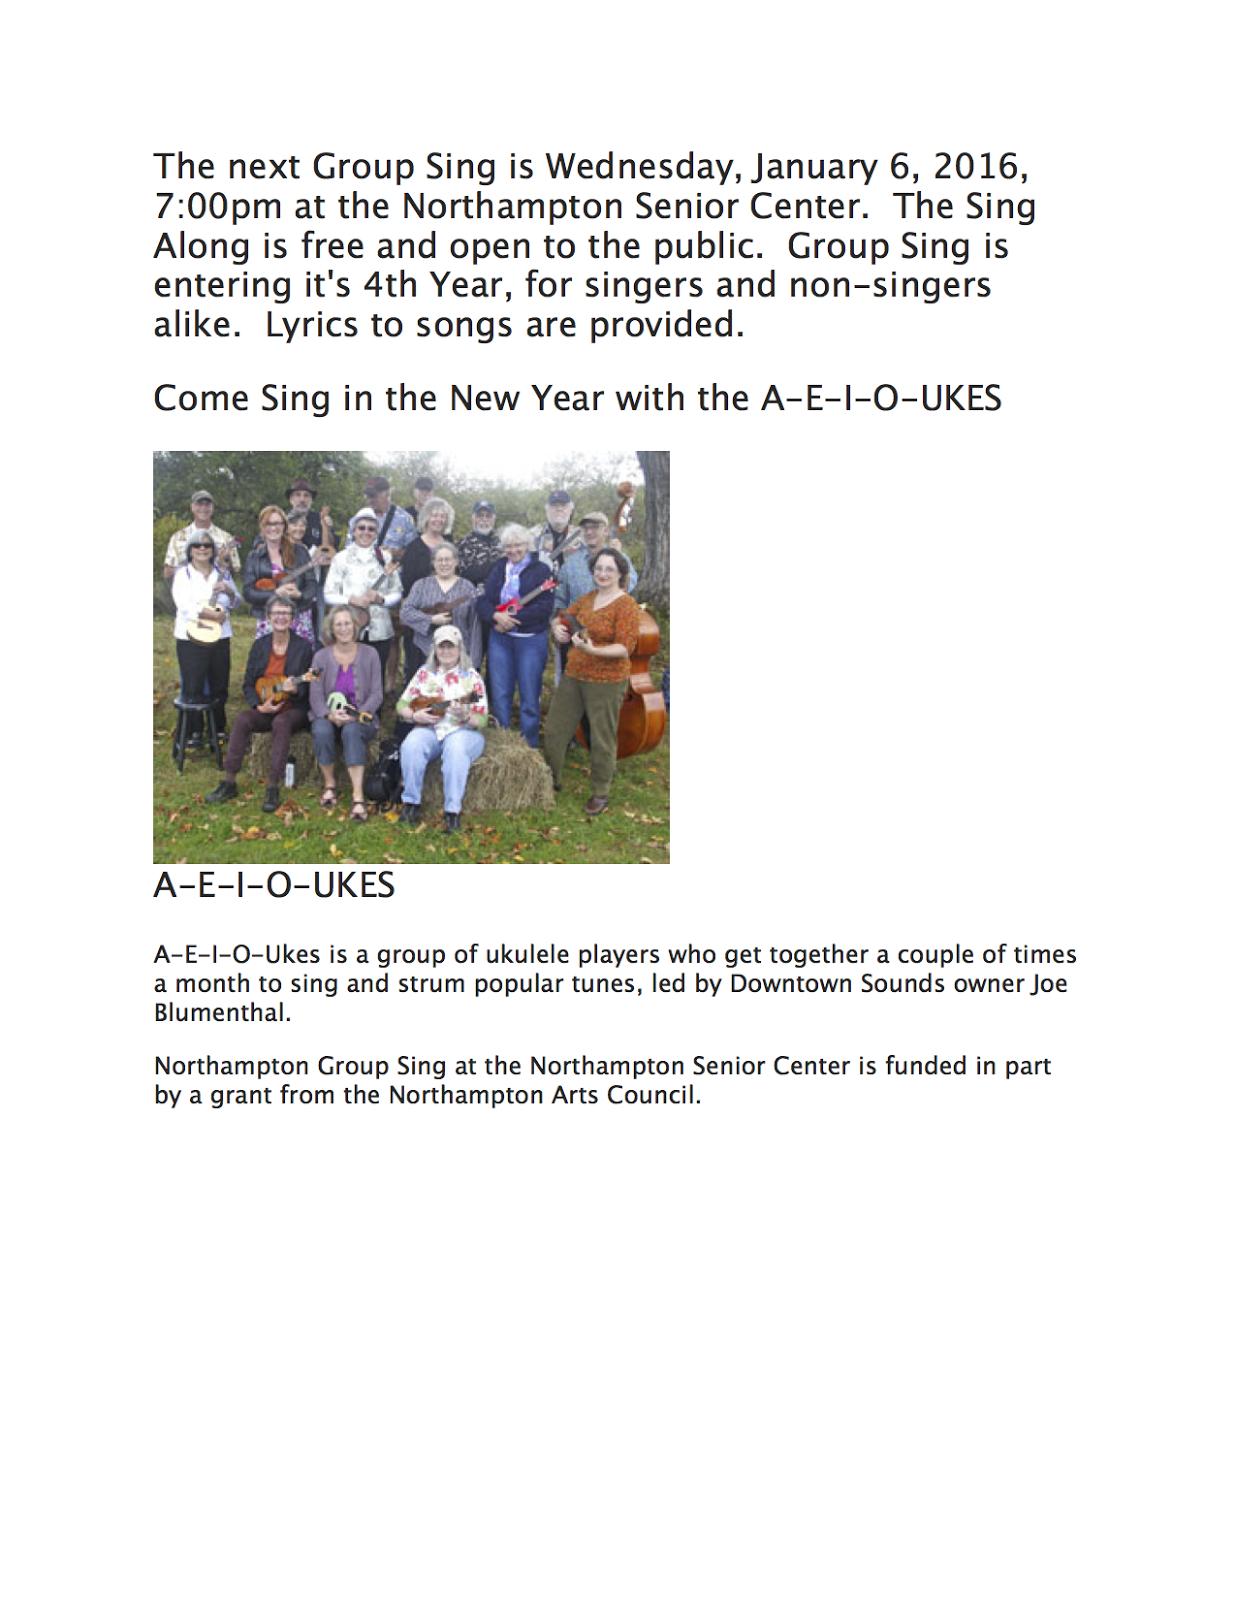 Northampton Arts Council: 2015